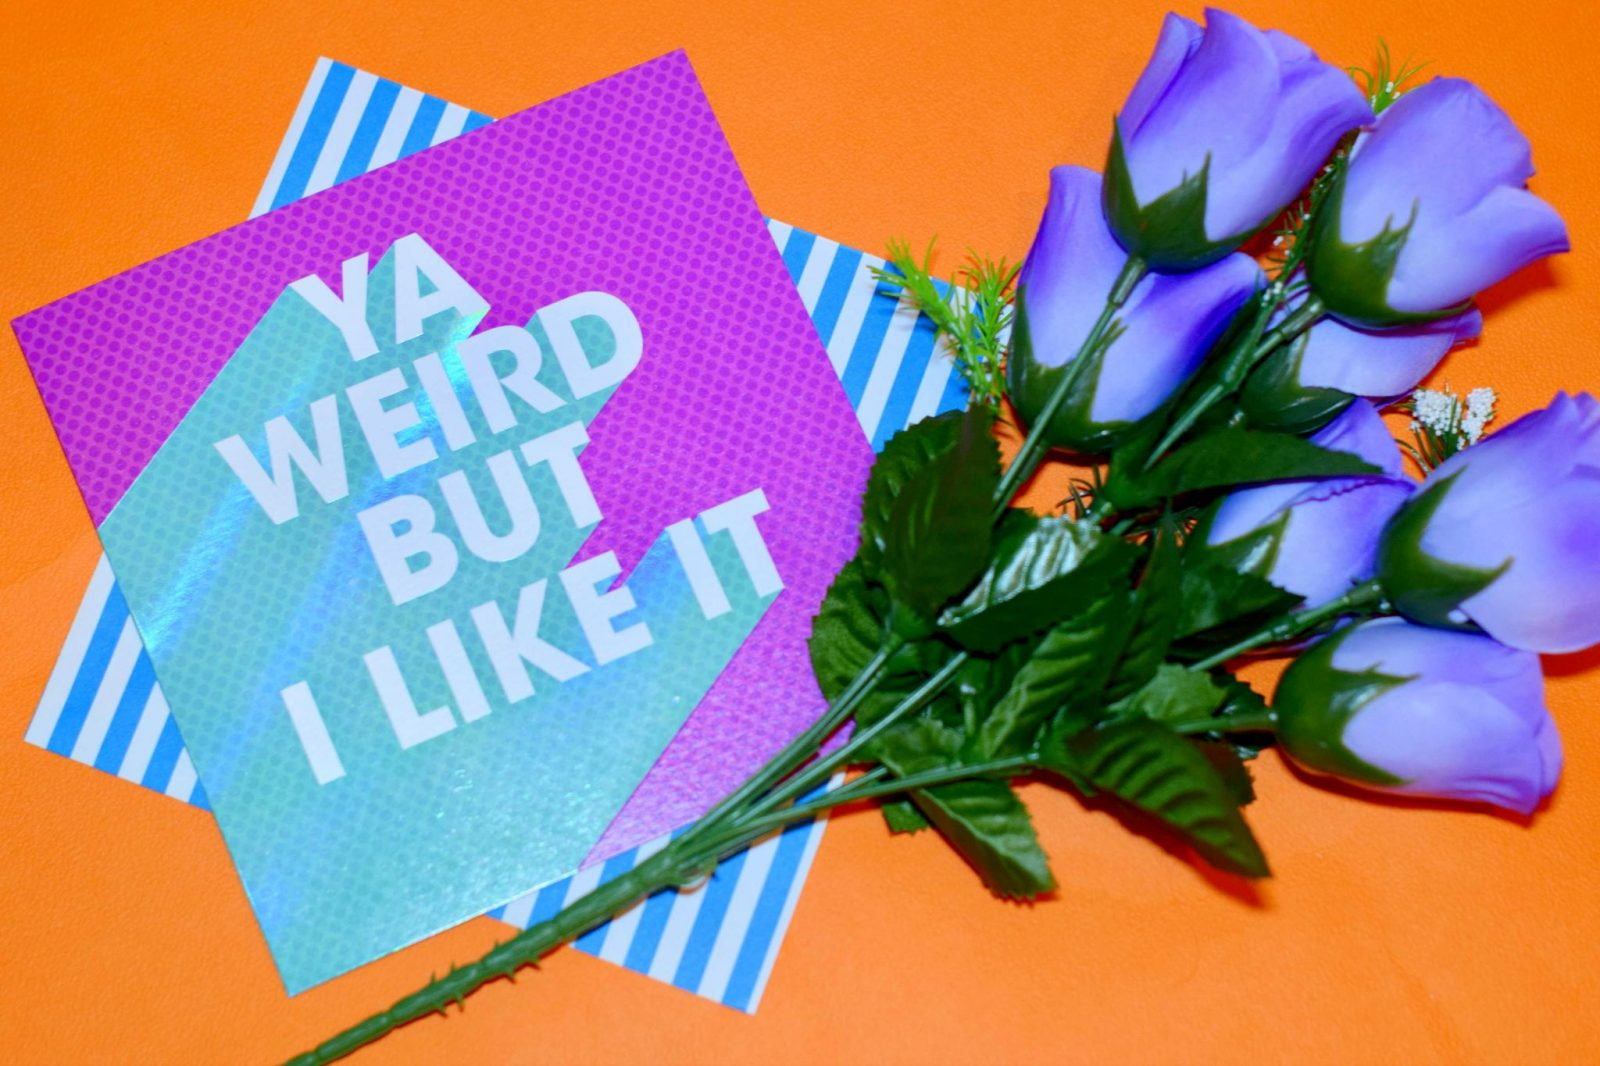 Ya weird but I like it Valentine's Day card